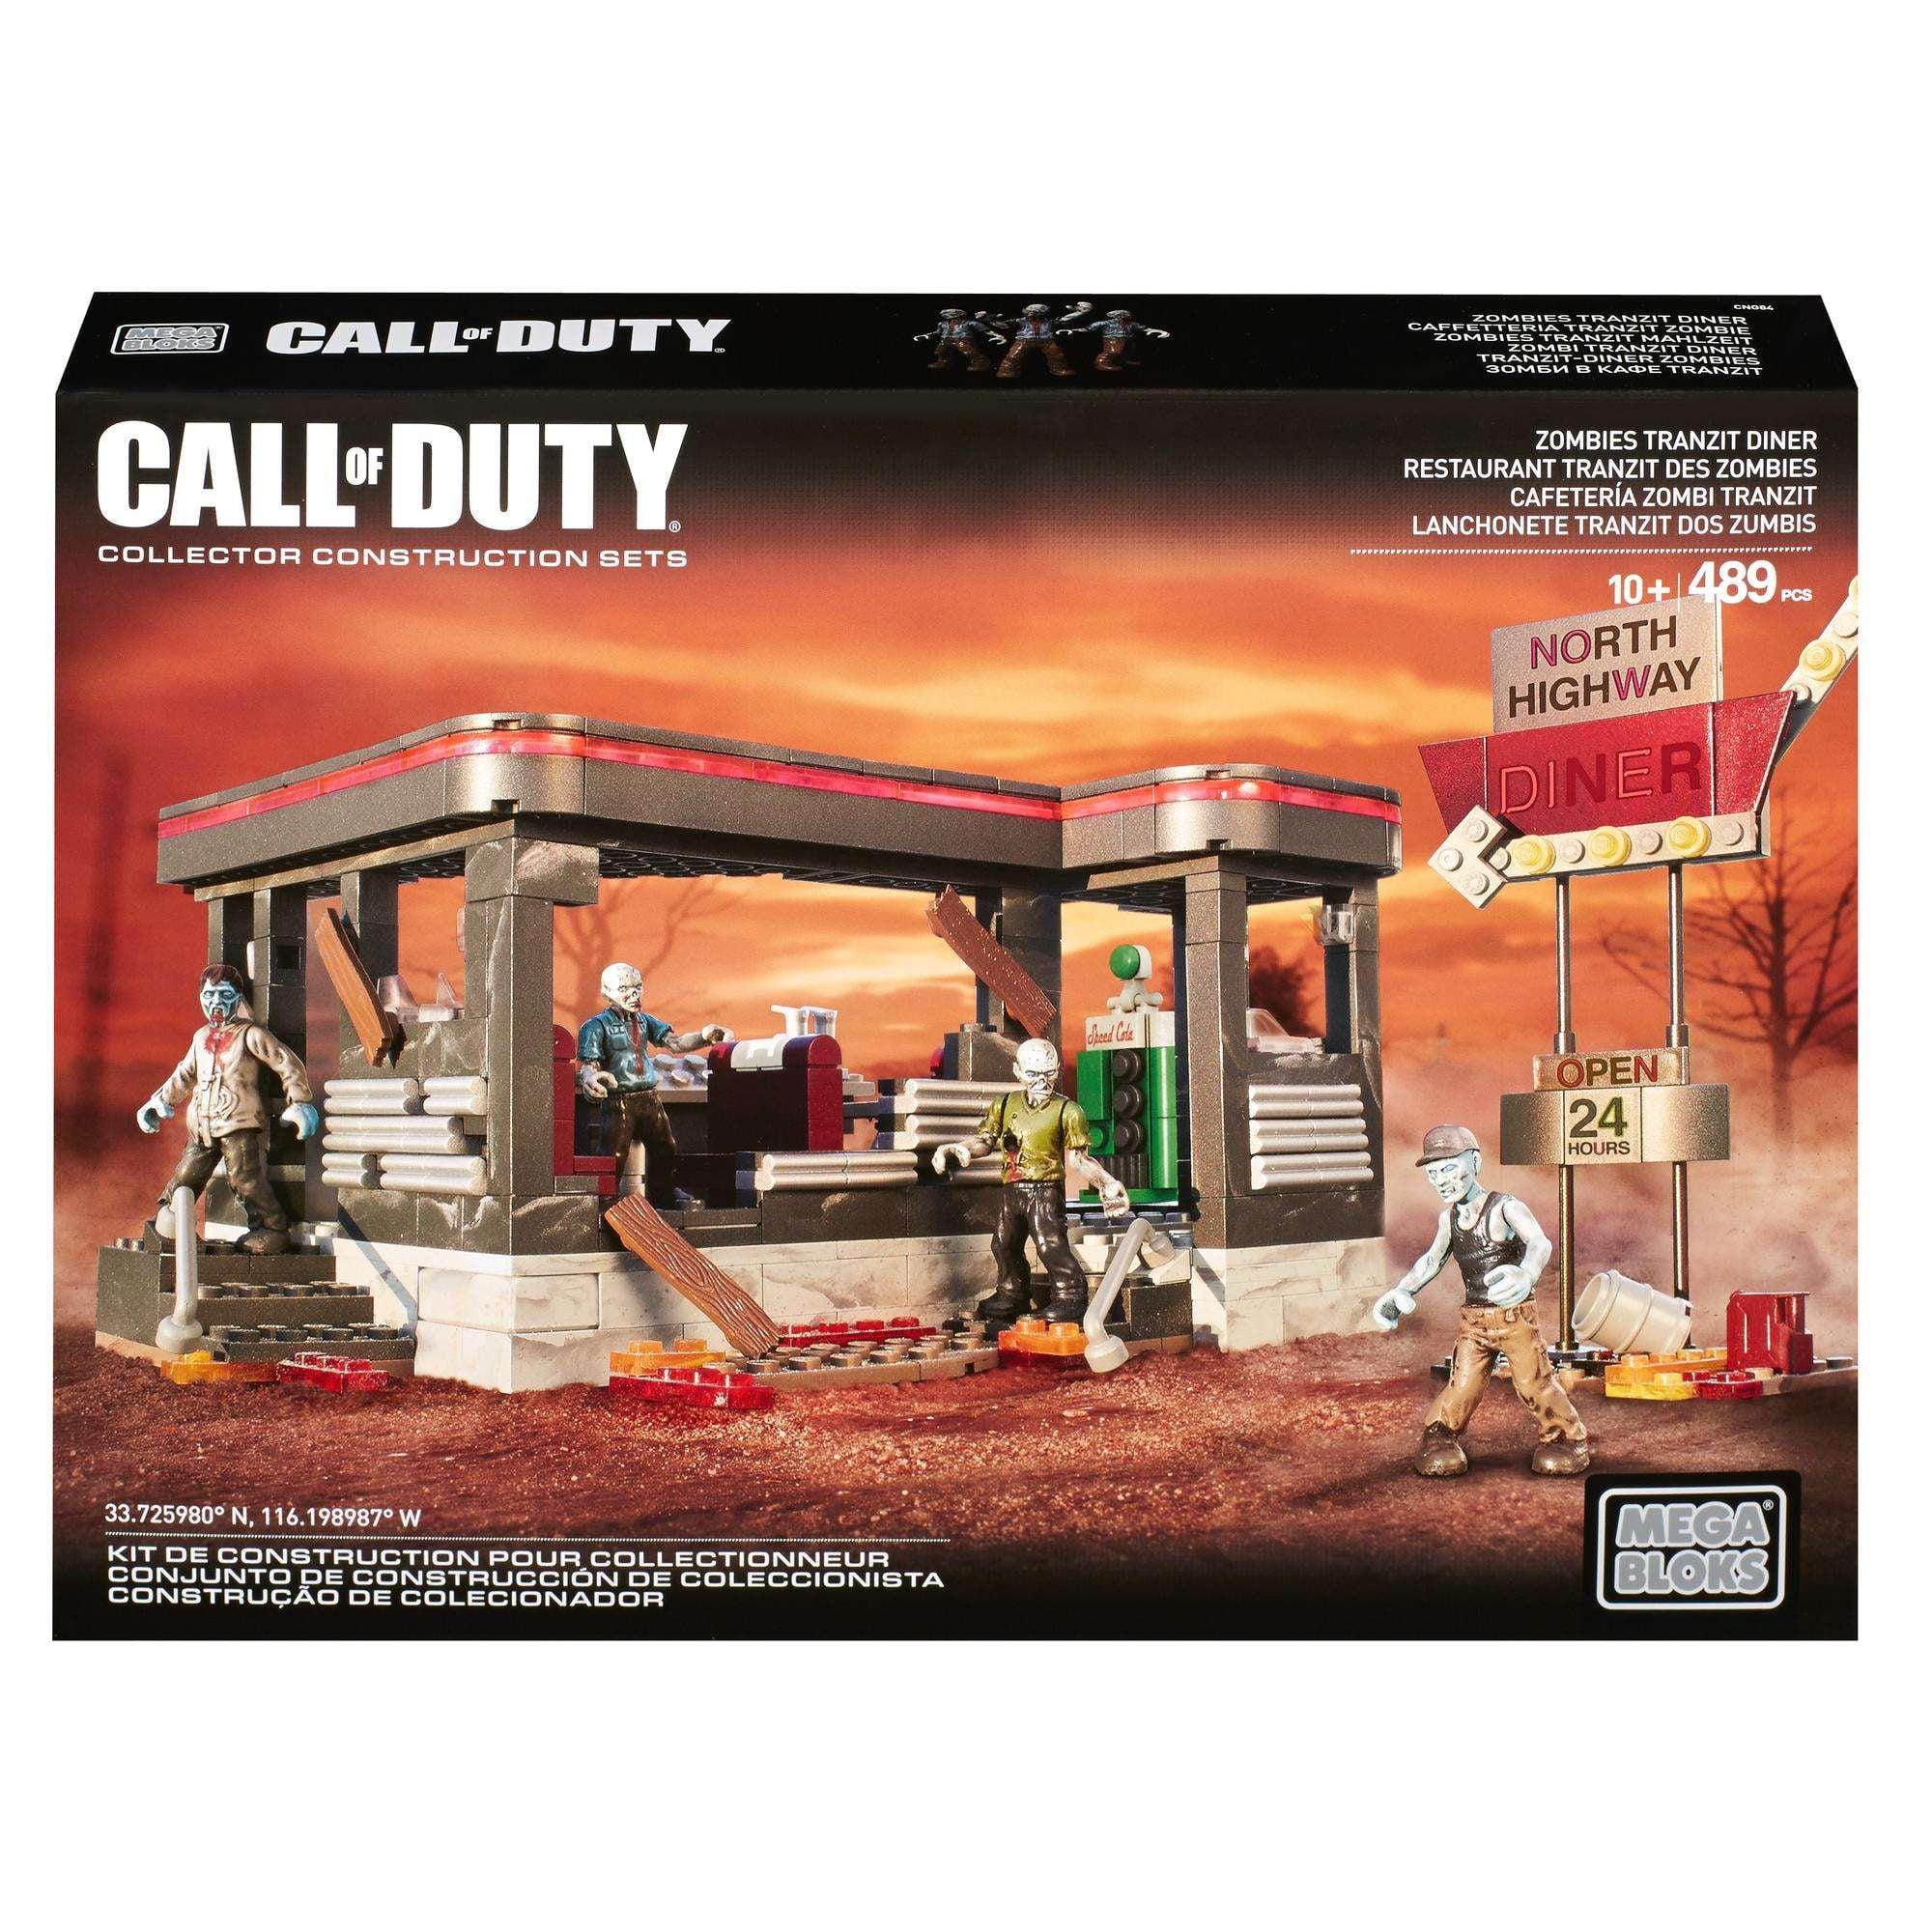 Mega Bloks Call of Duty Zombies TranZit Diner by Mattel